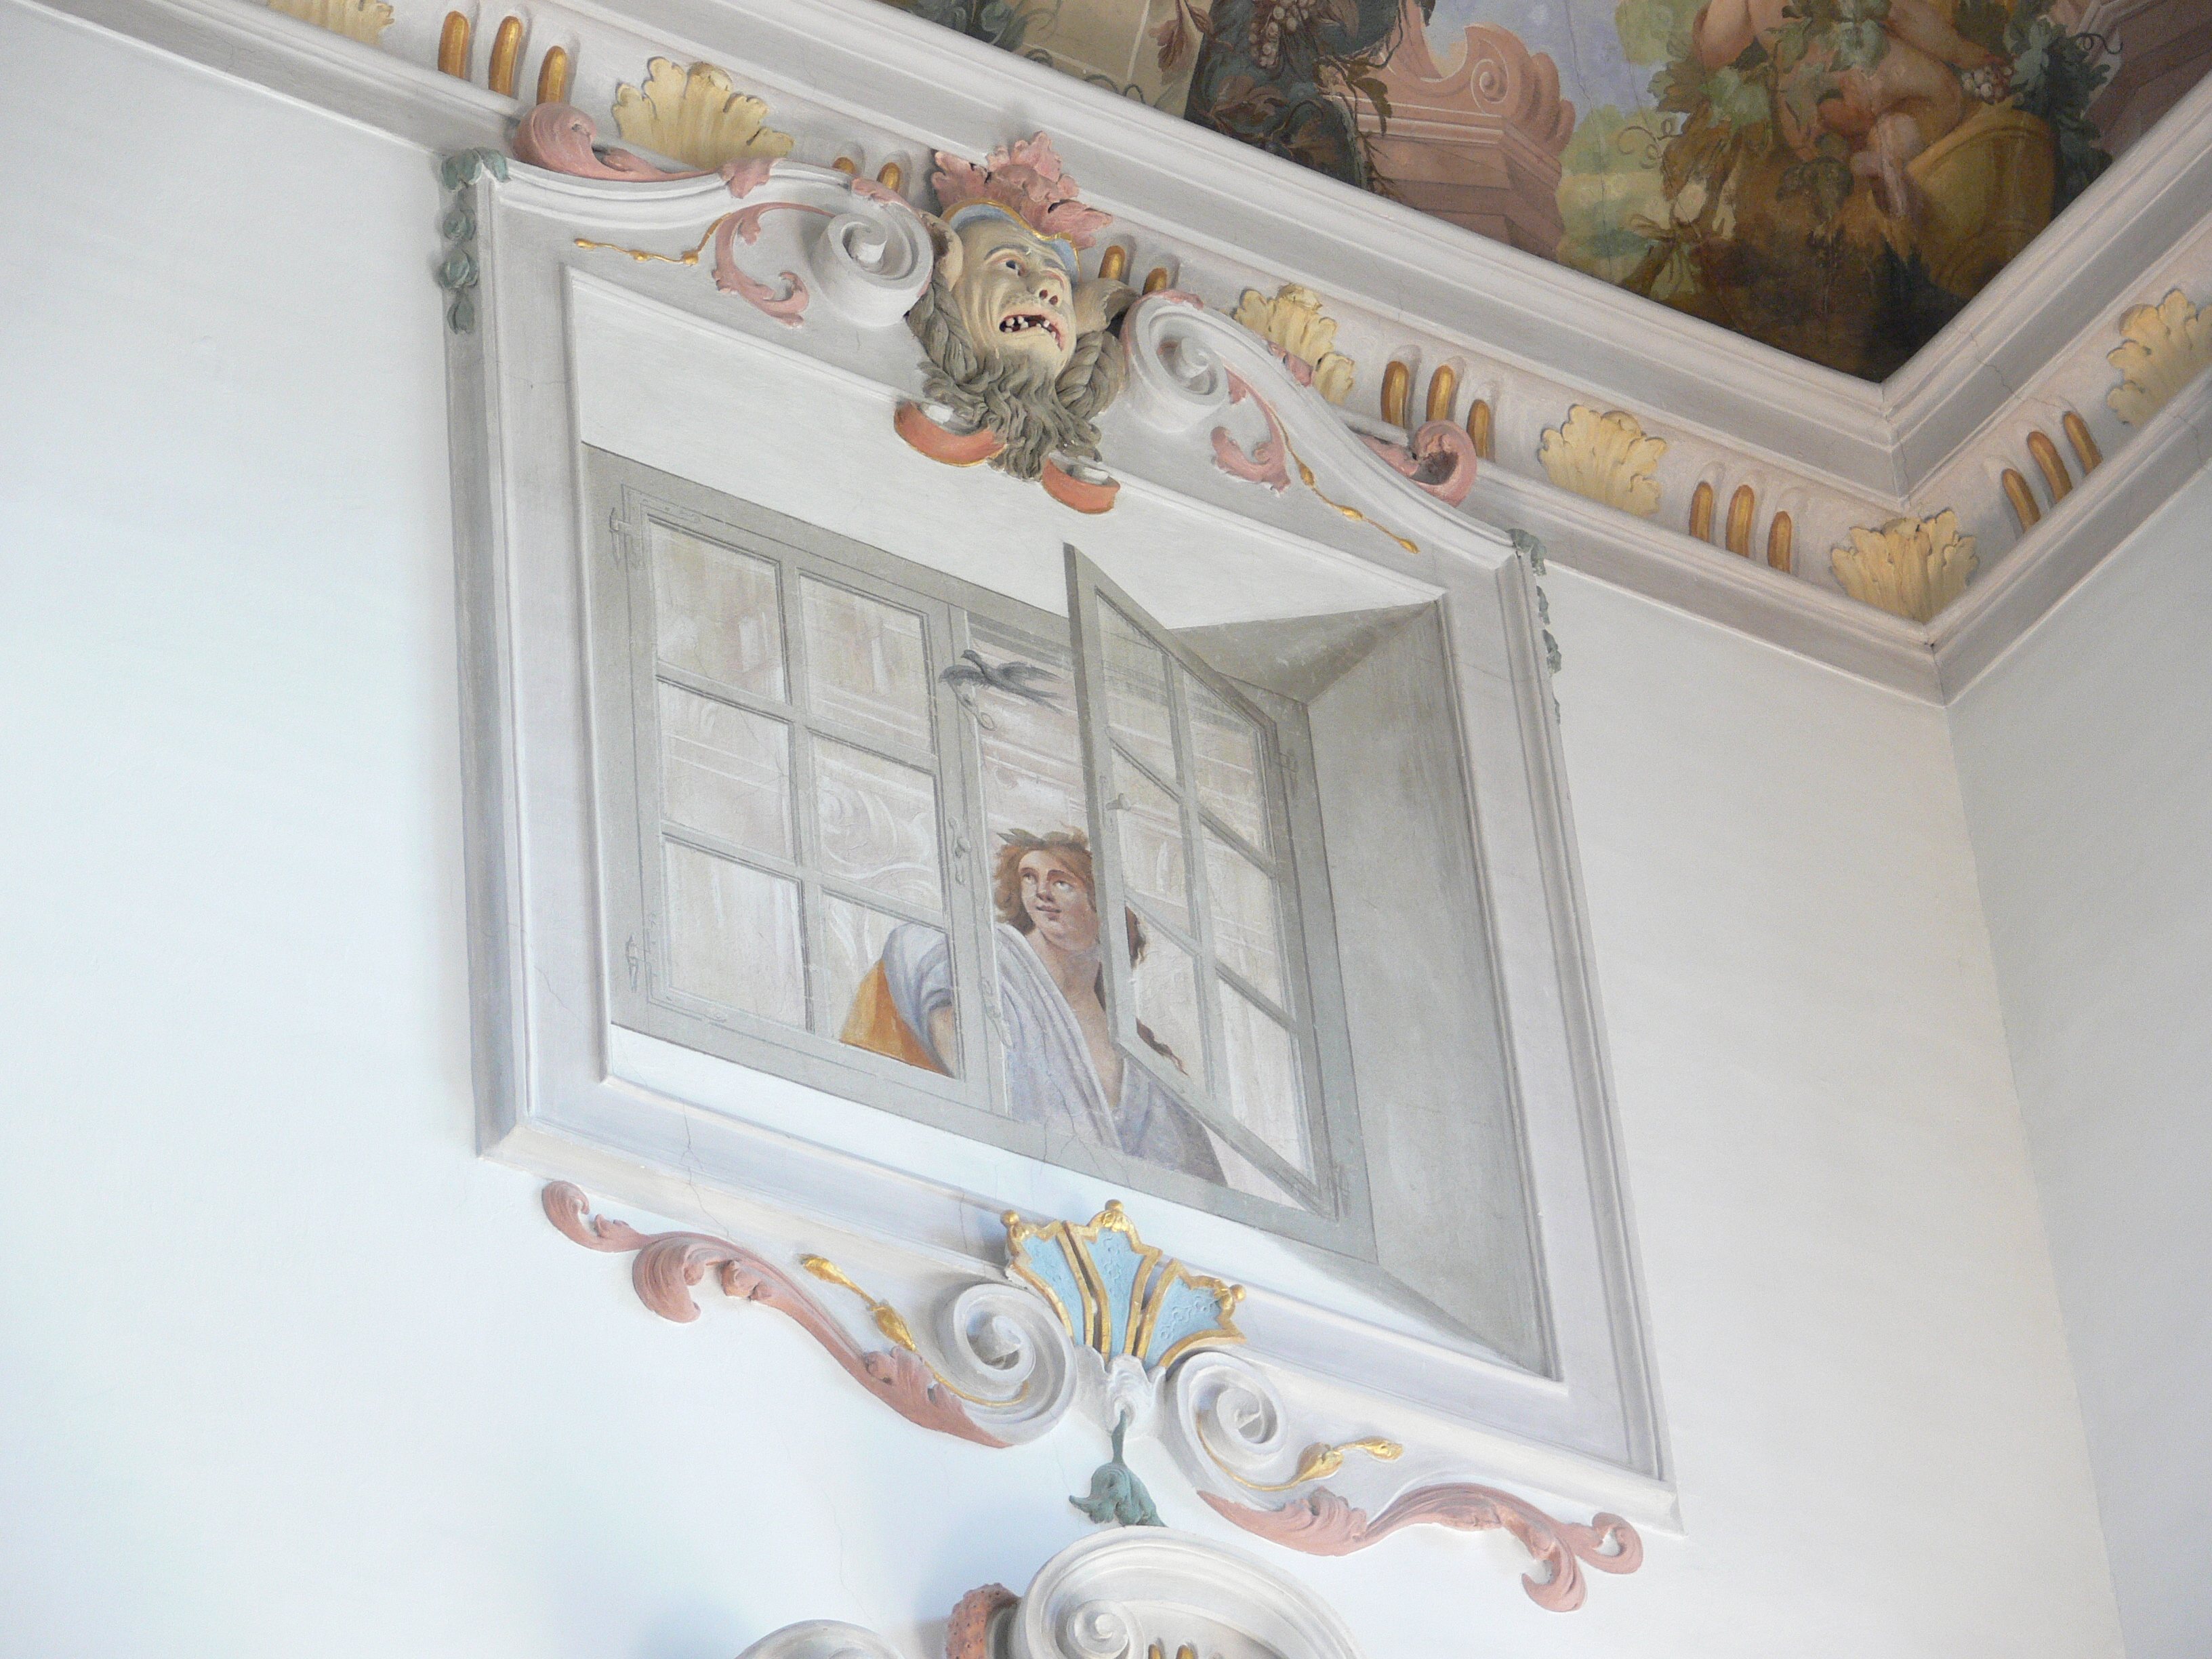 Fenster Bad Wurzach : Description Schloss Wurzach Treppenhaus Fenster Trompeloeil 1jpg